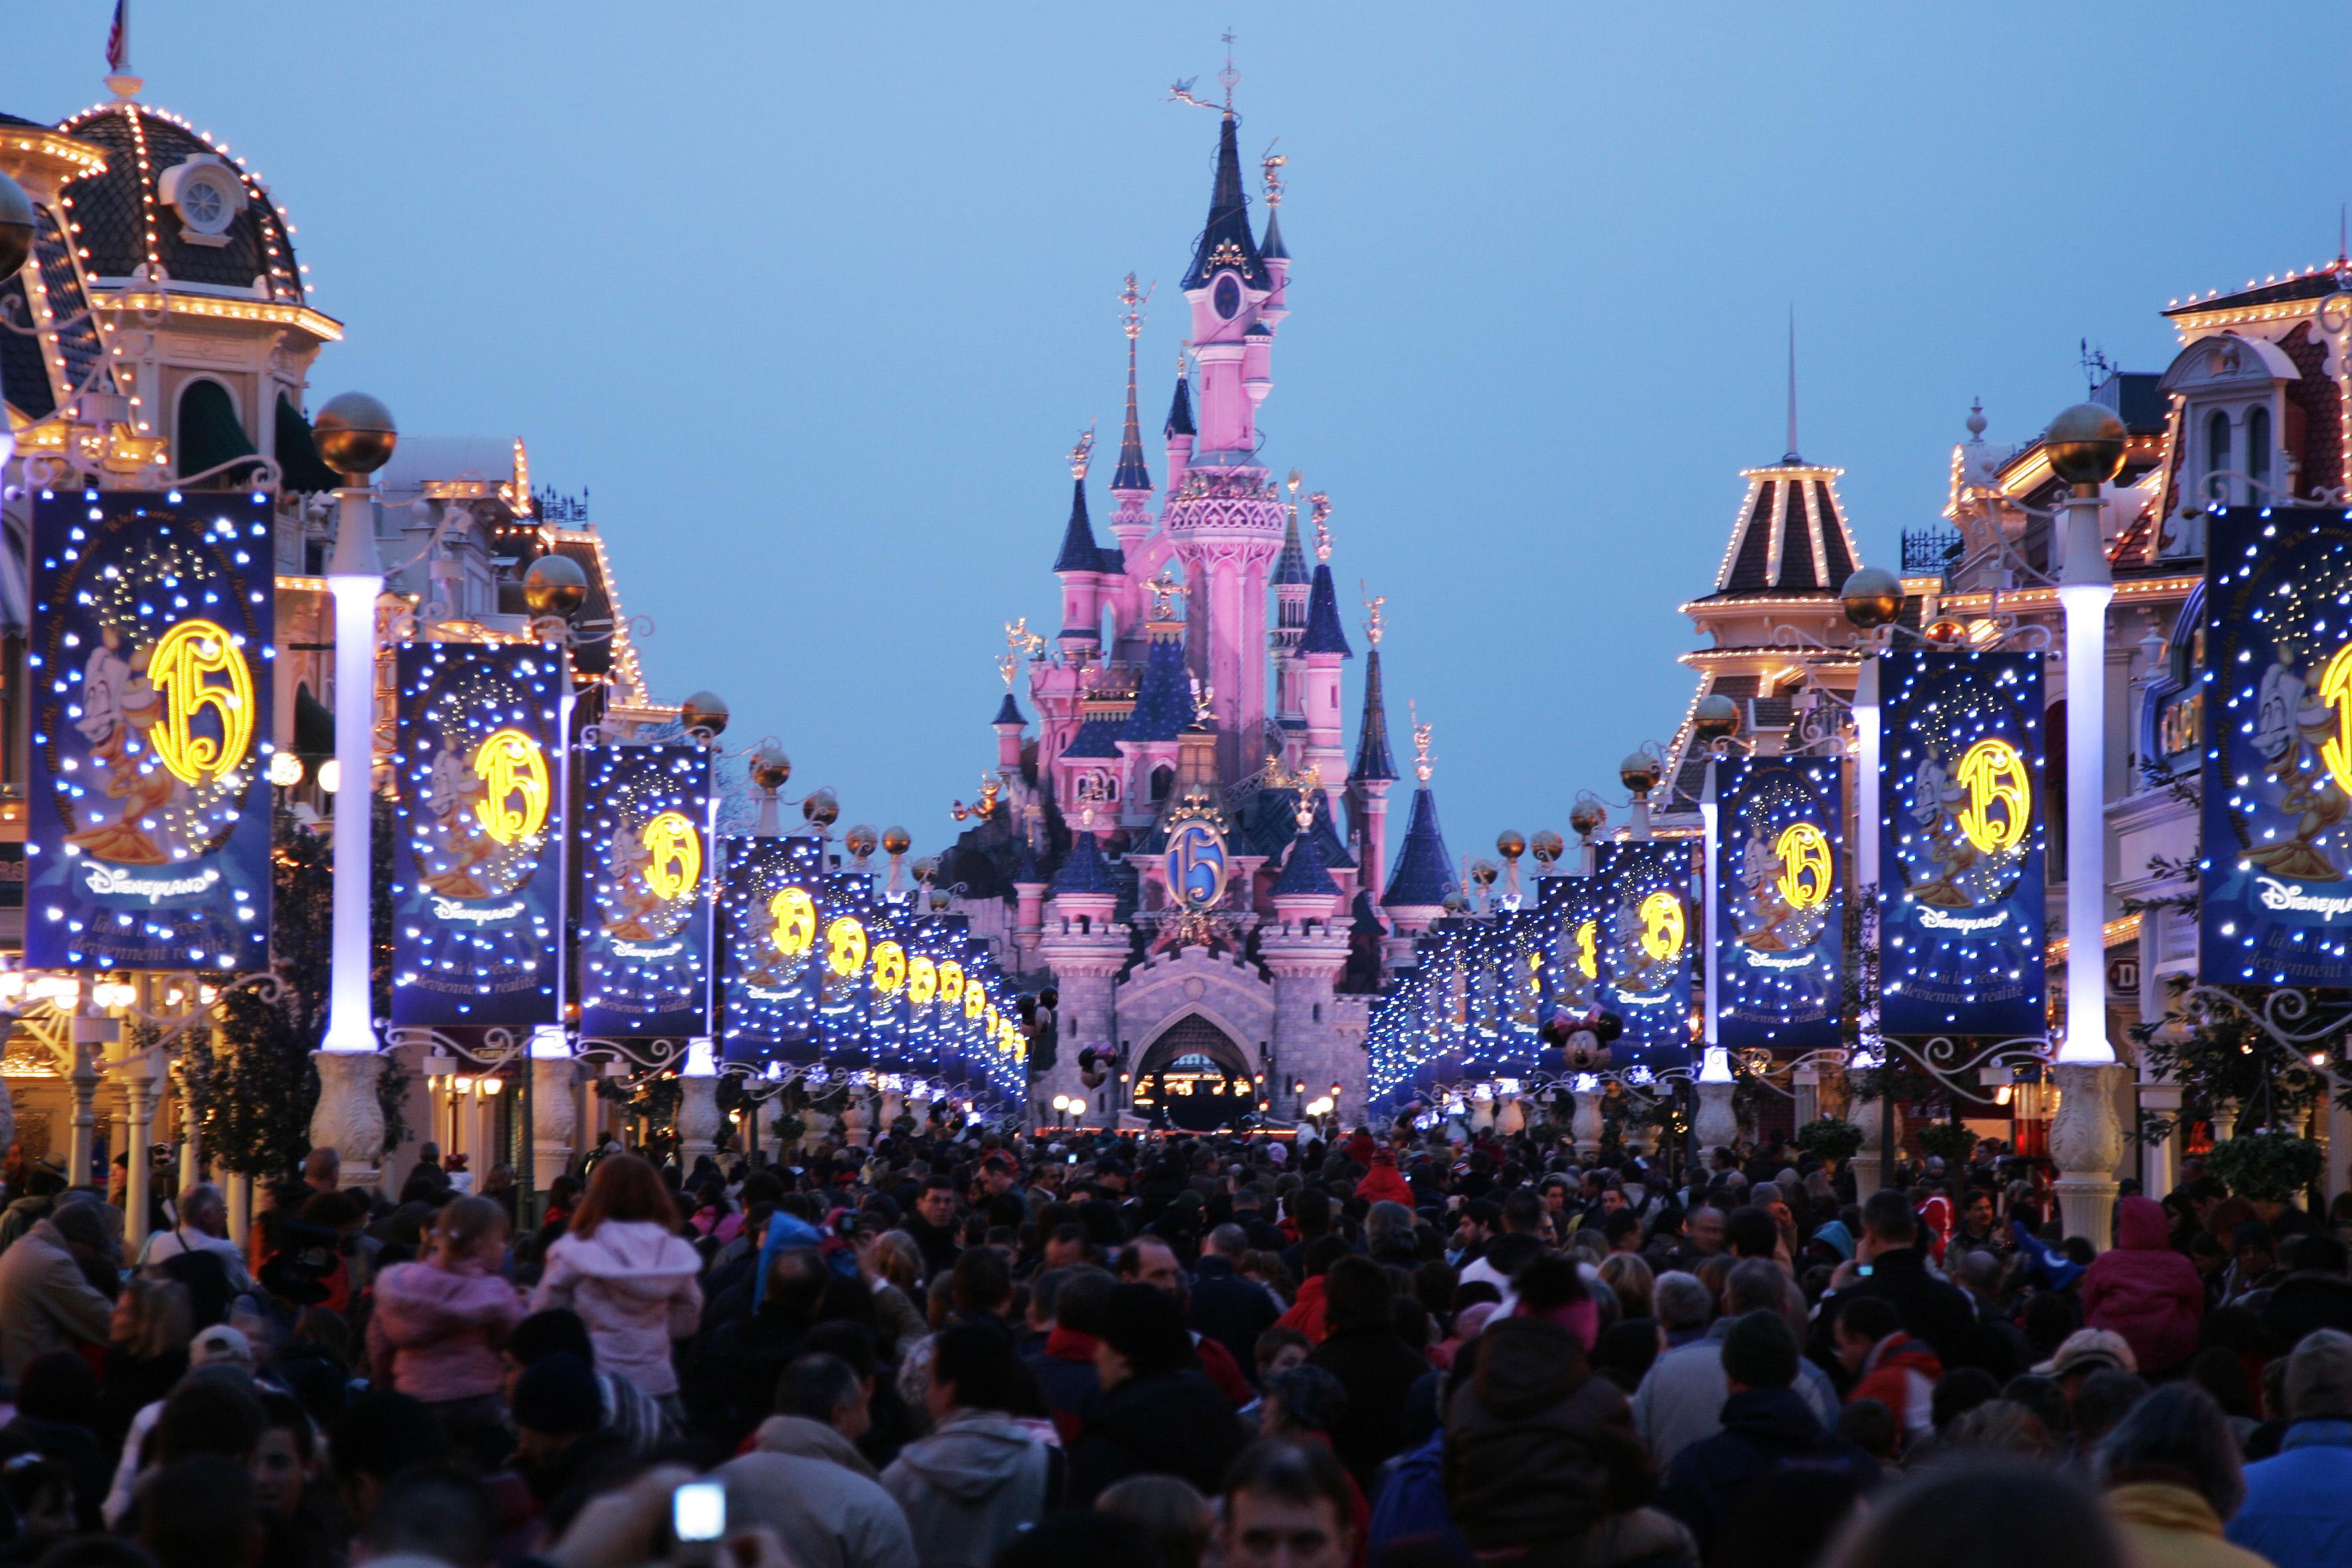 Sleeping Beauty Castle during Disneyland Paris - 15th Anniversary Celebration at Disneyland Paris in Marne-La-Vallee / Paris, France.